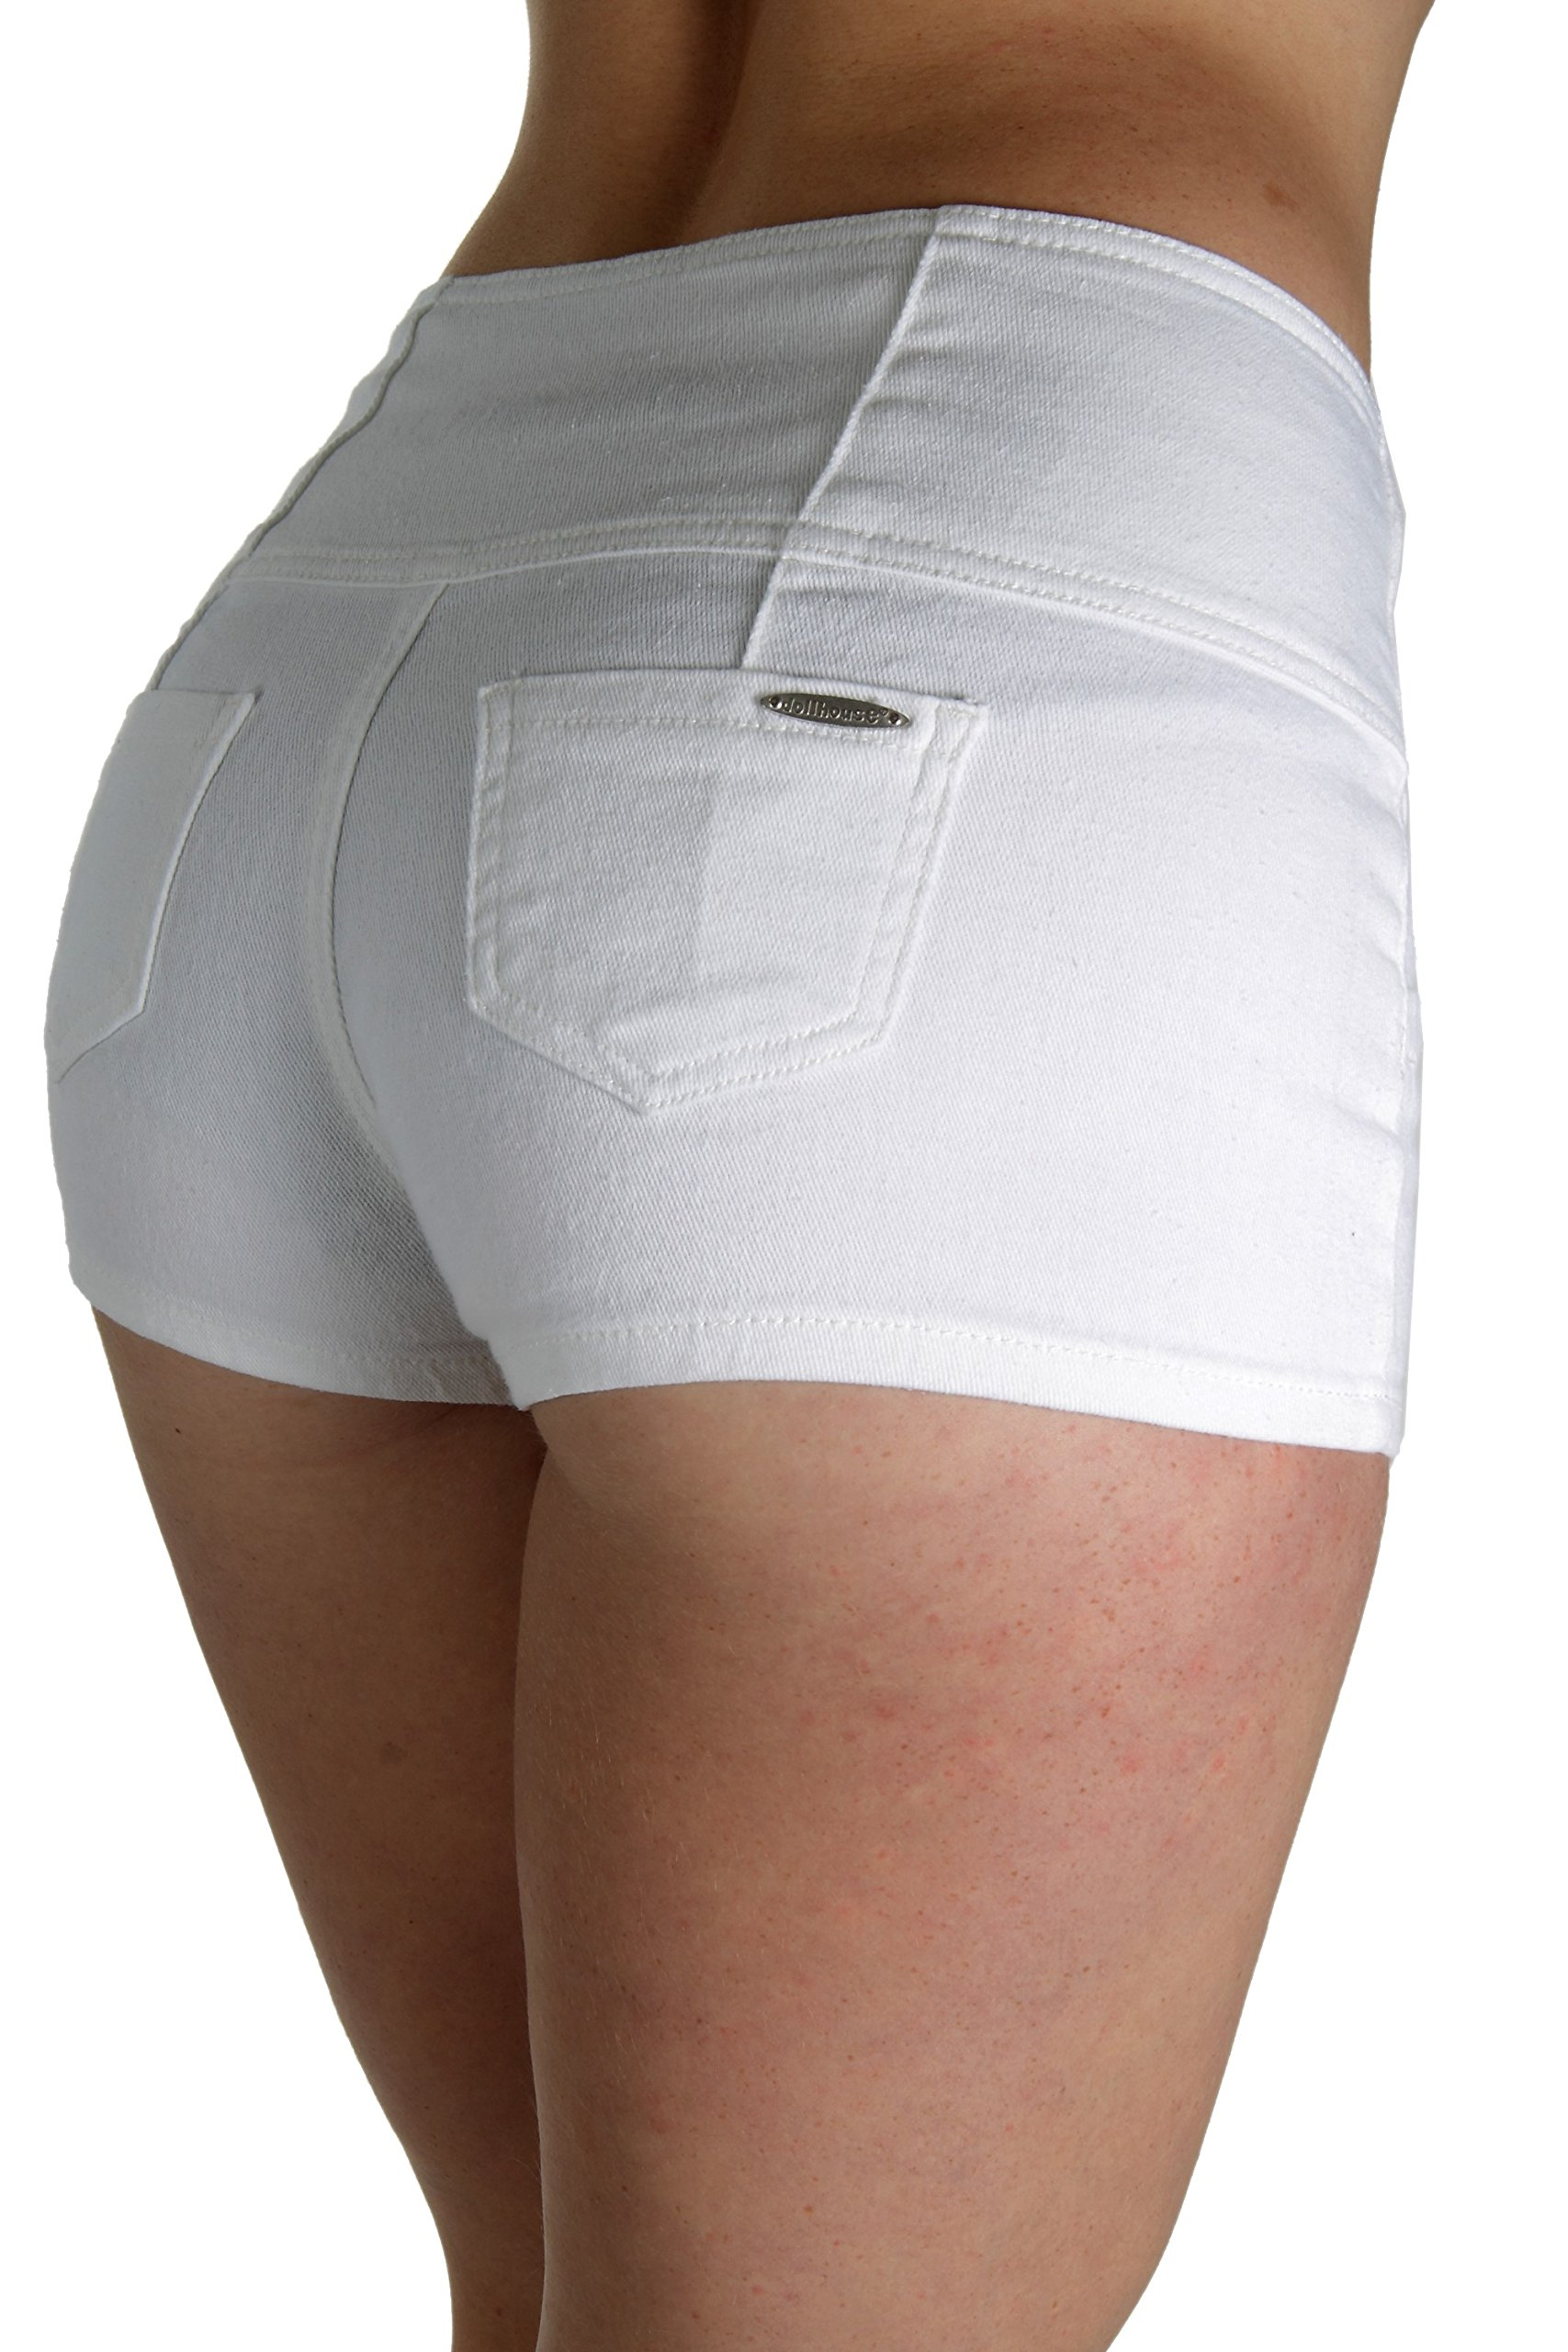 dollhouse AS8586SH, Premium High Waist Booty Shorts in White Size 7